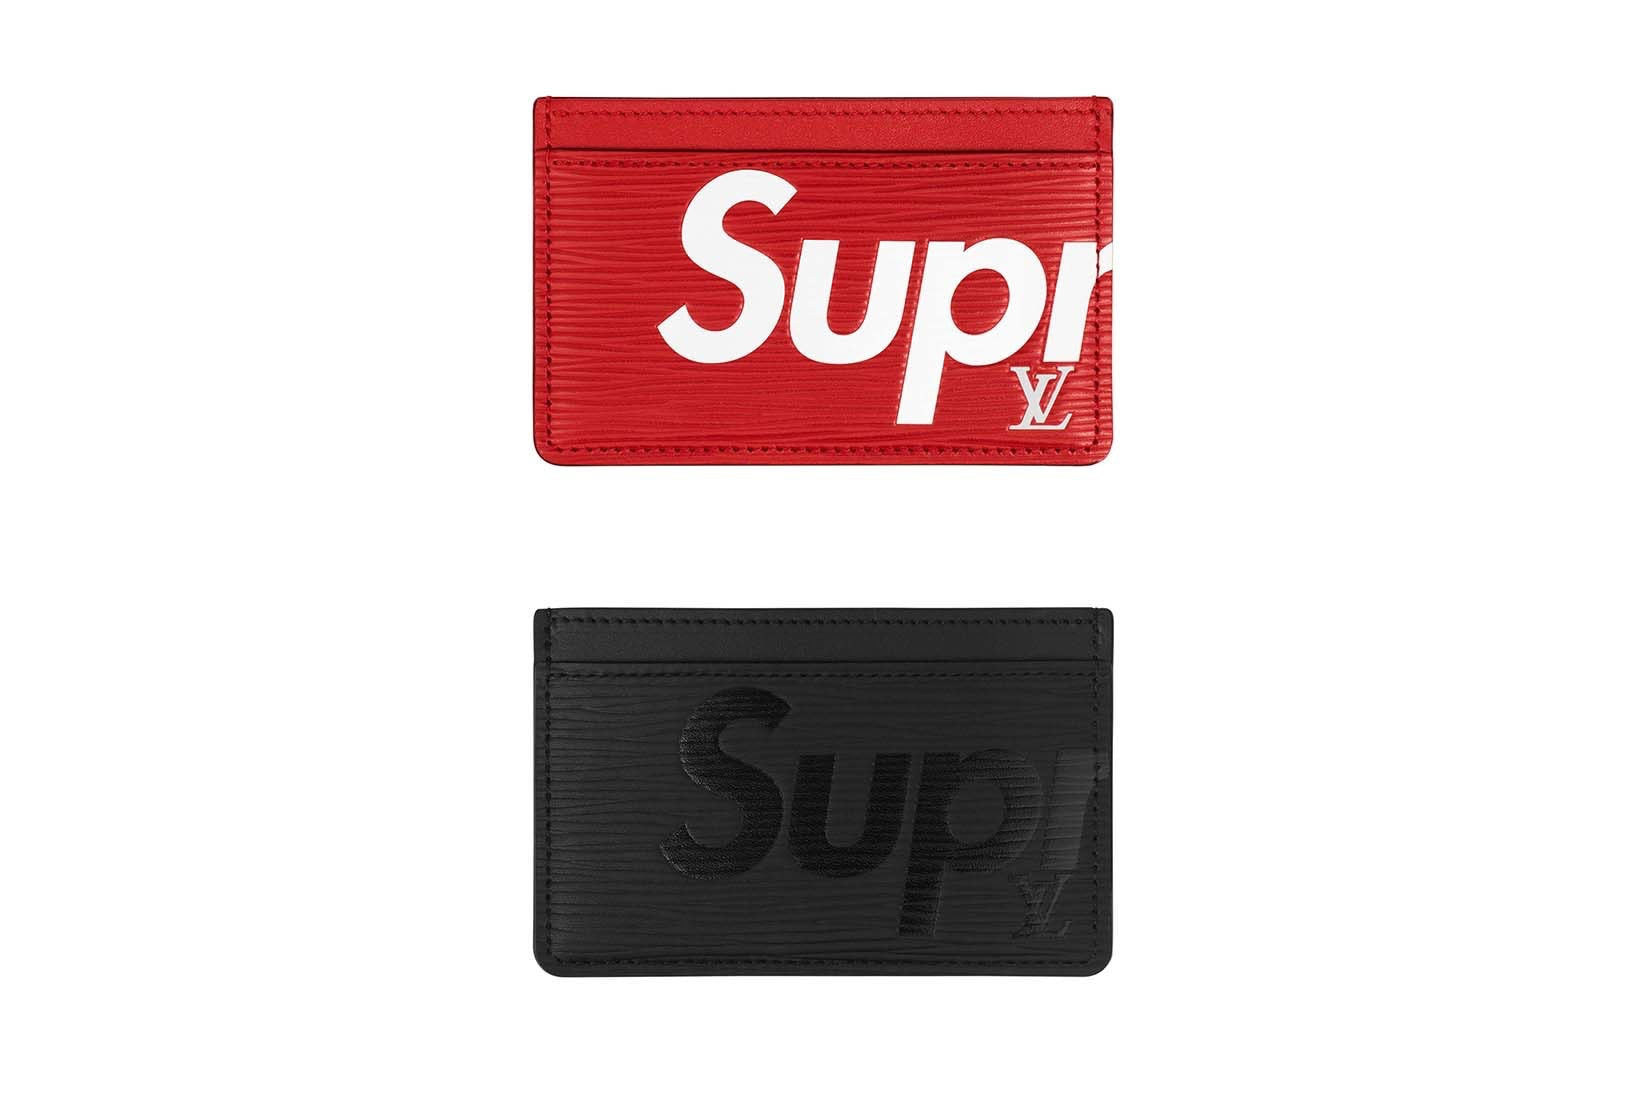 Supreme(シュプリーム)×Louis Vuitton(ルイ・ヴィトン) / ポルト カード シンプル(Porte Carte Simple)